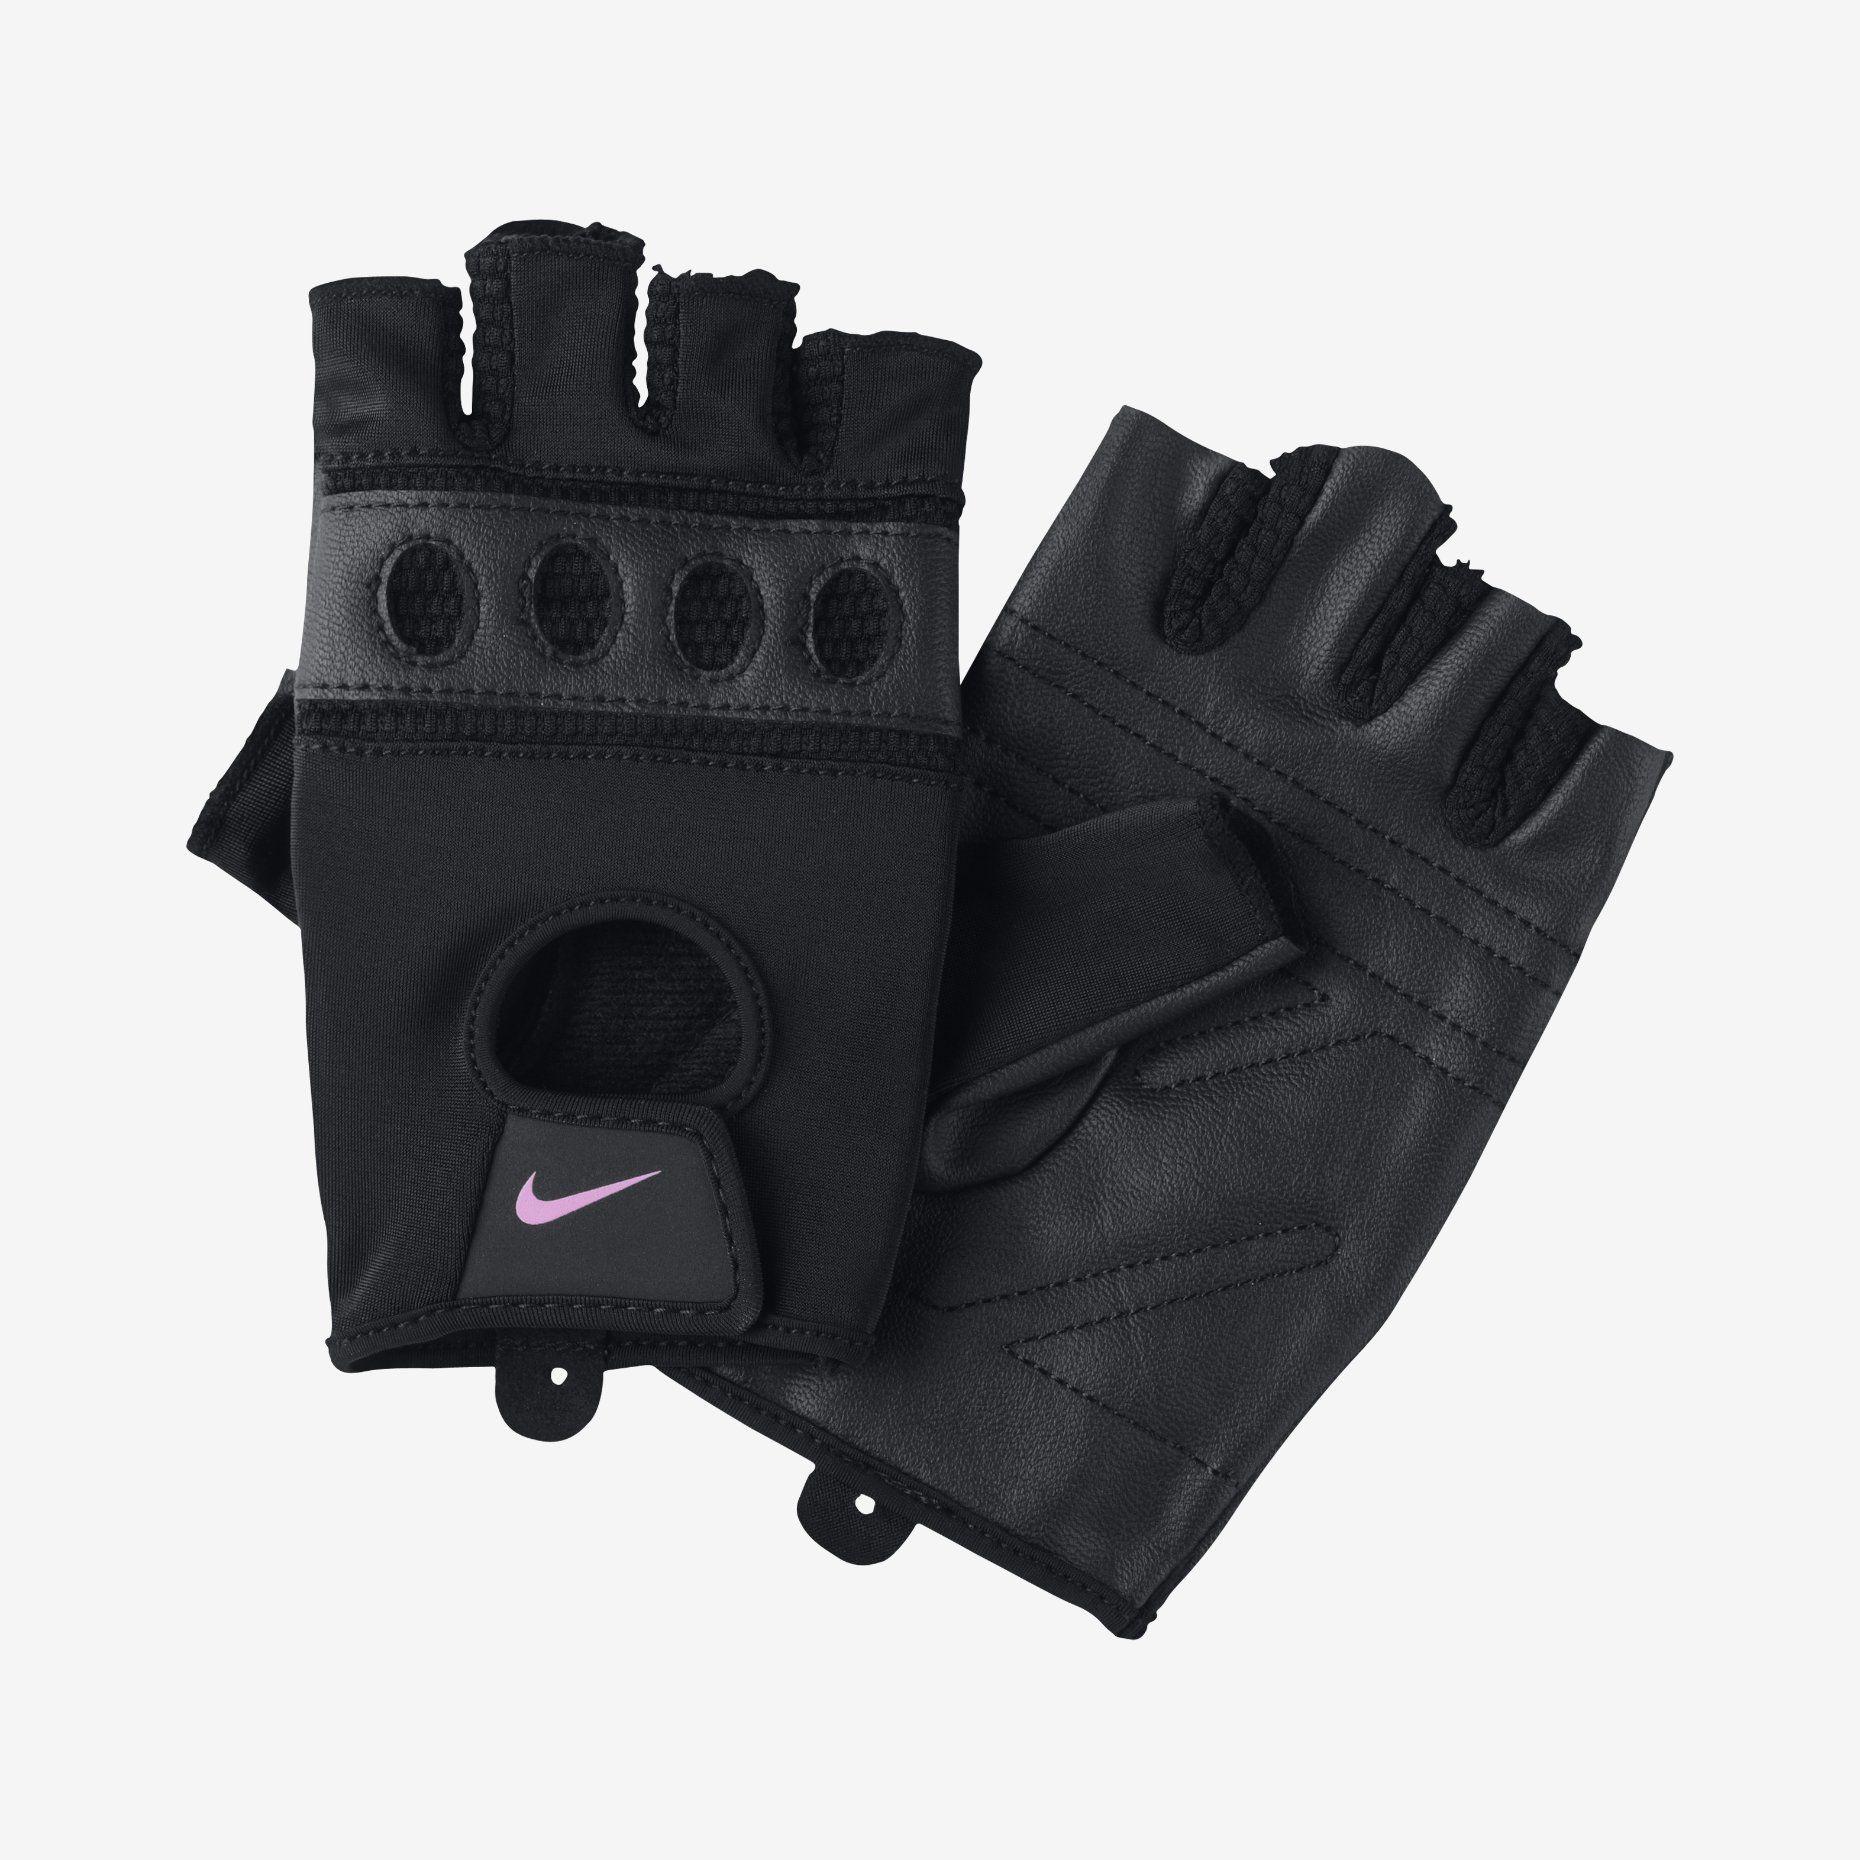 borroso Cubo Irónico  Nike Pro Flow Women's Training Gloves. Nike Store UK | Training gloves,  Gloves, Gym crossfit workout